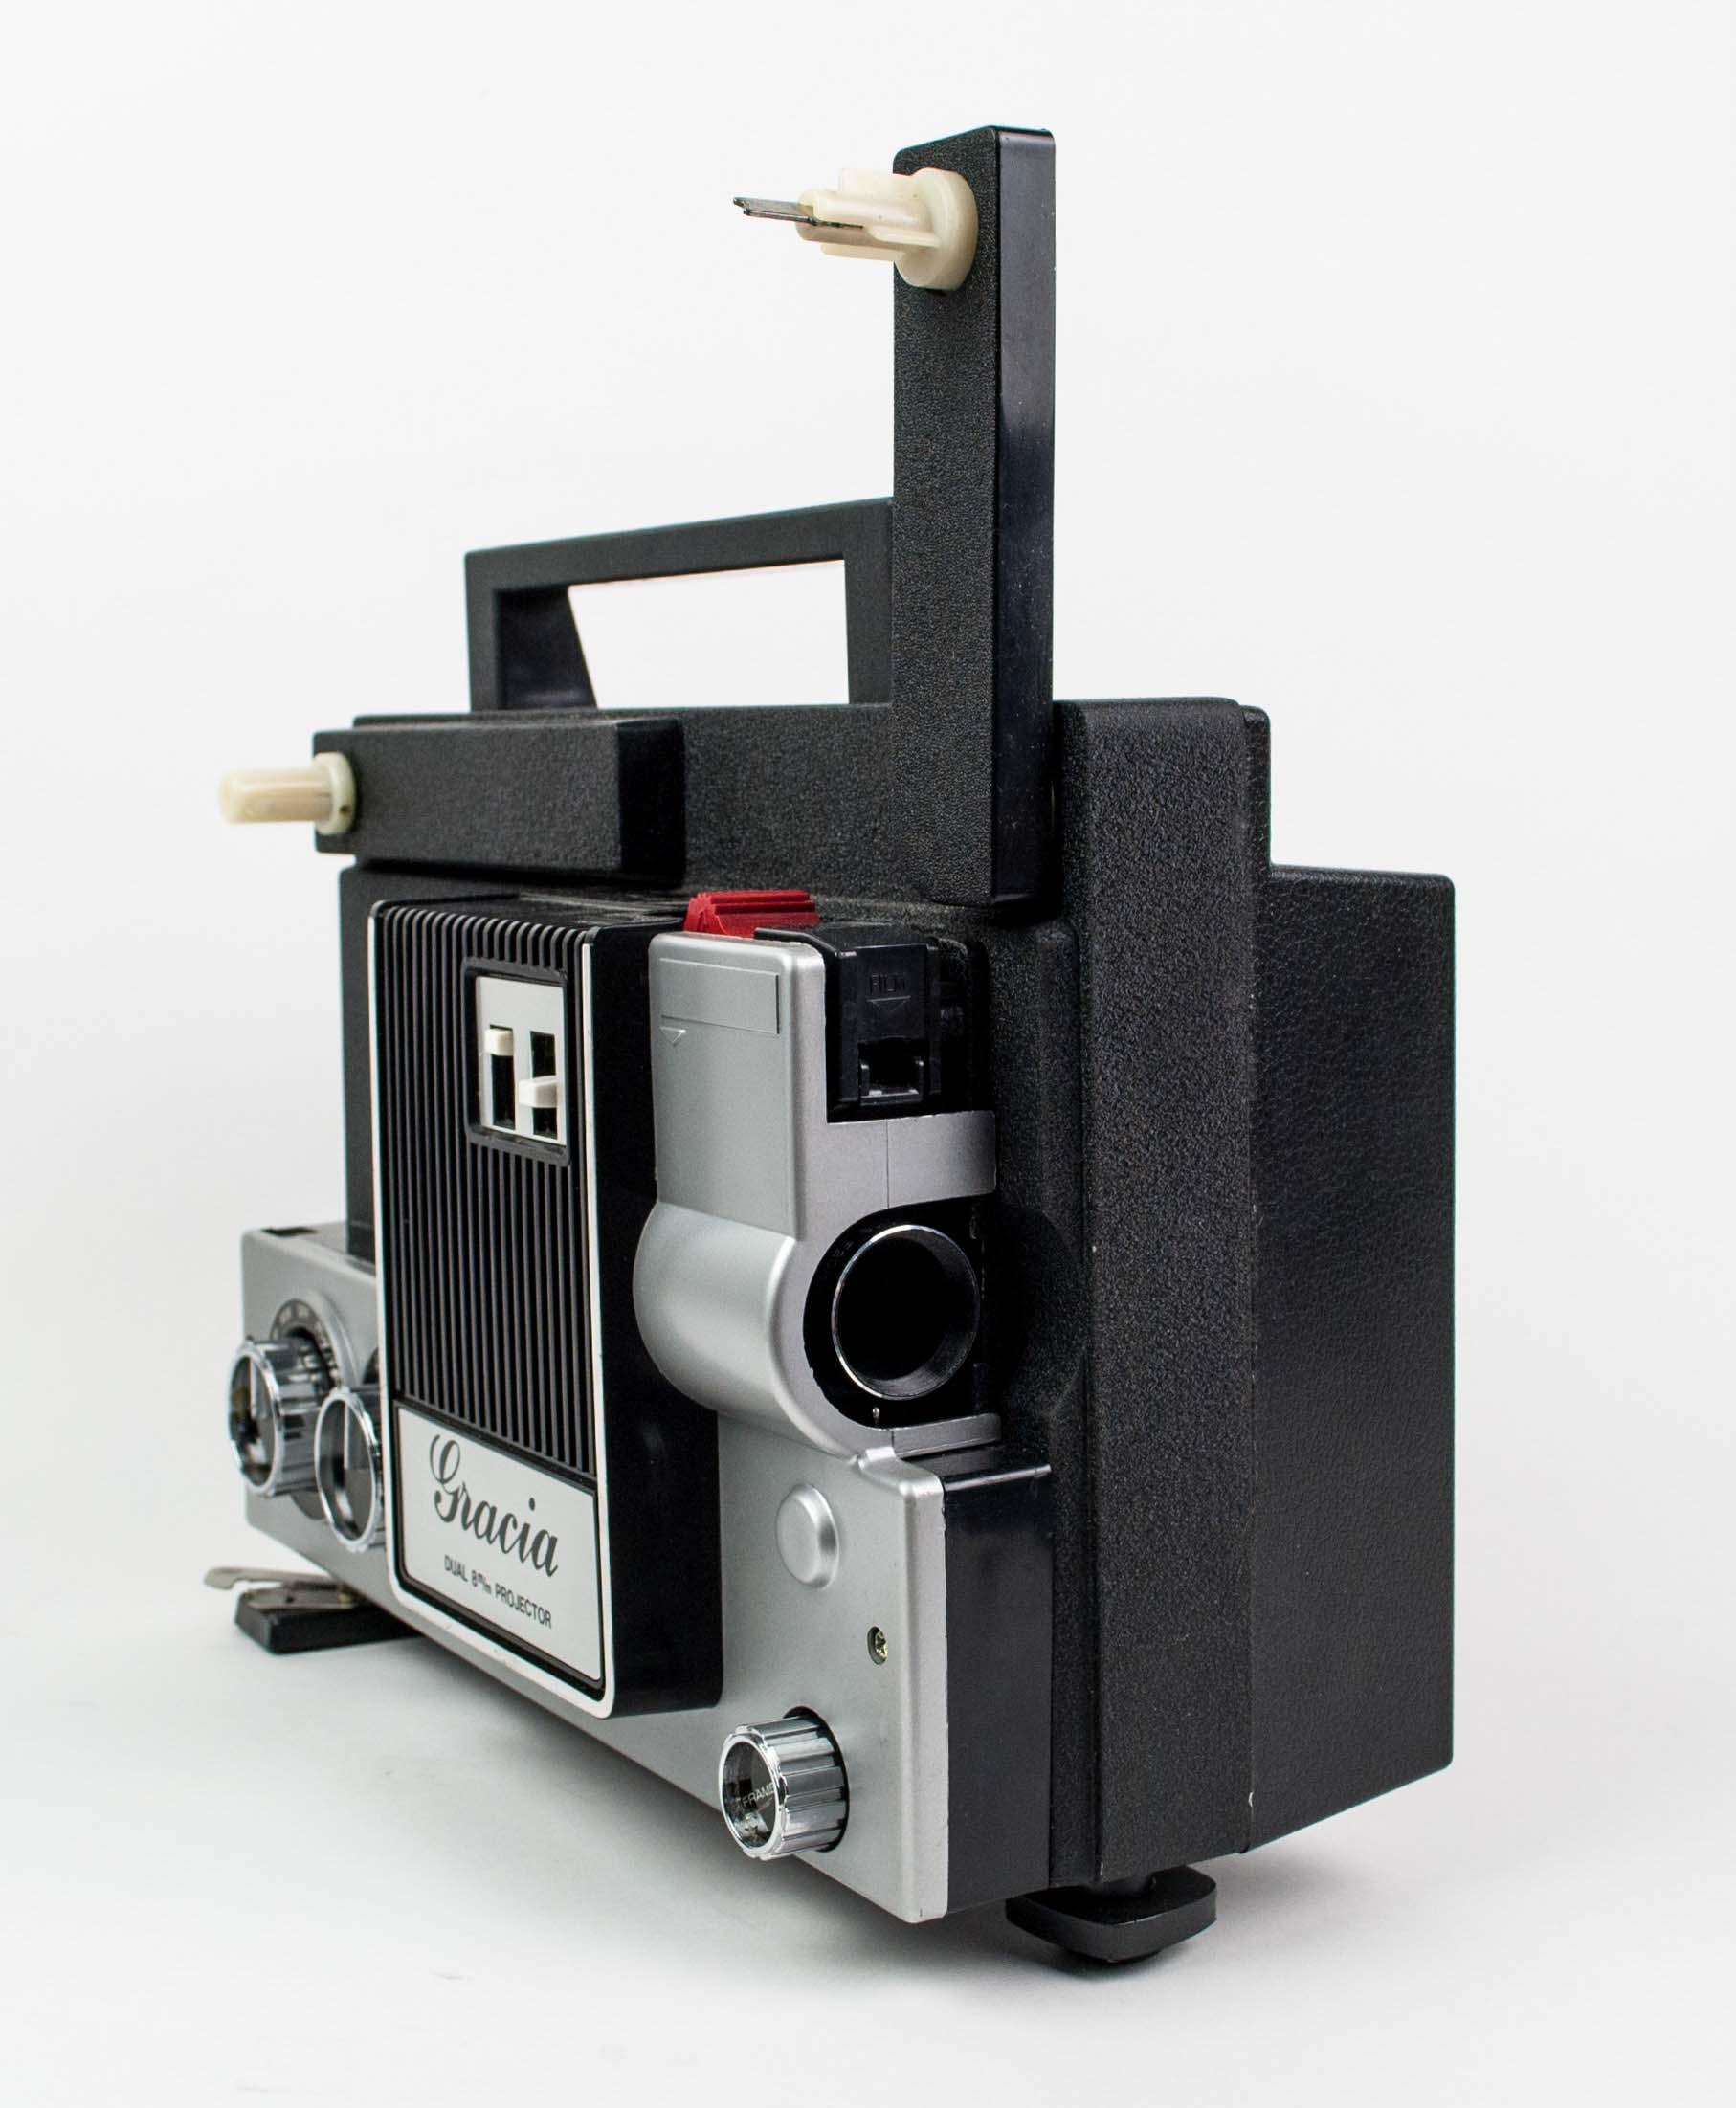 Dual 8mm projector